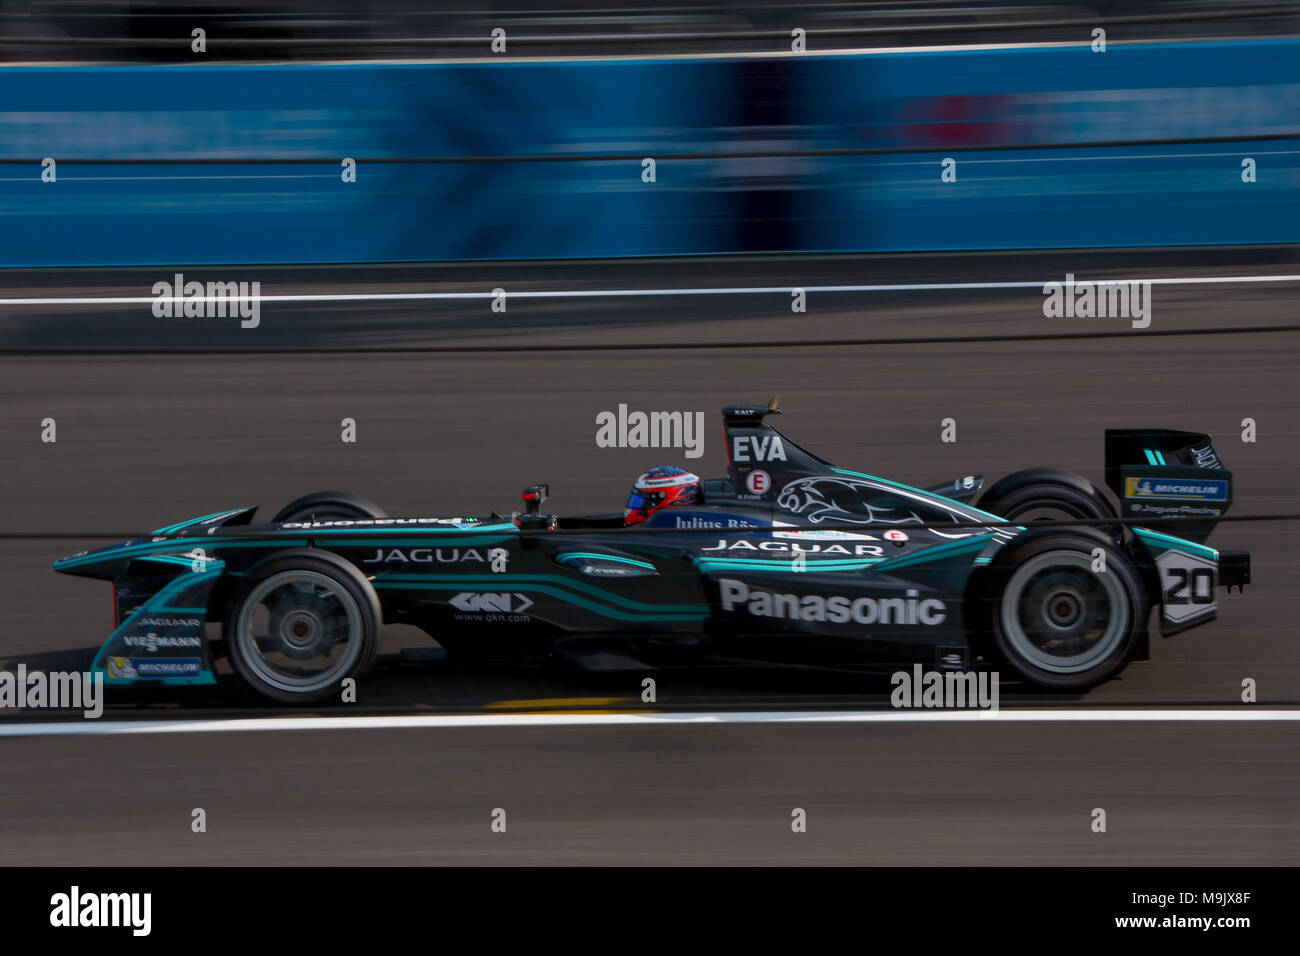 Formula e car during e-prix in mexico - Stock Image